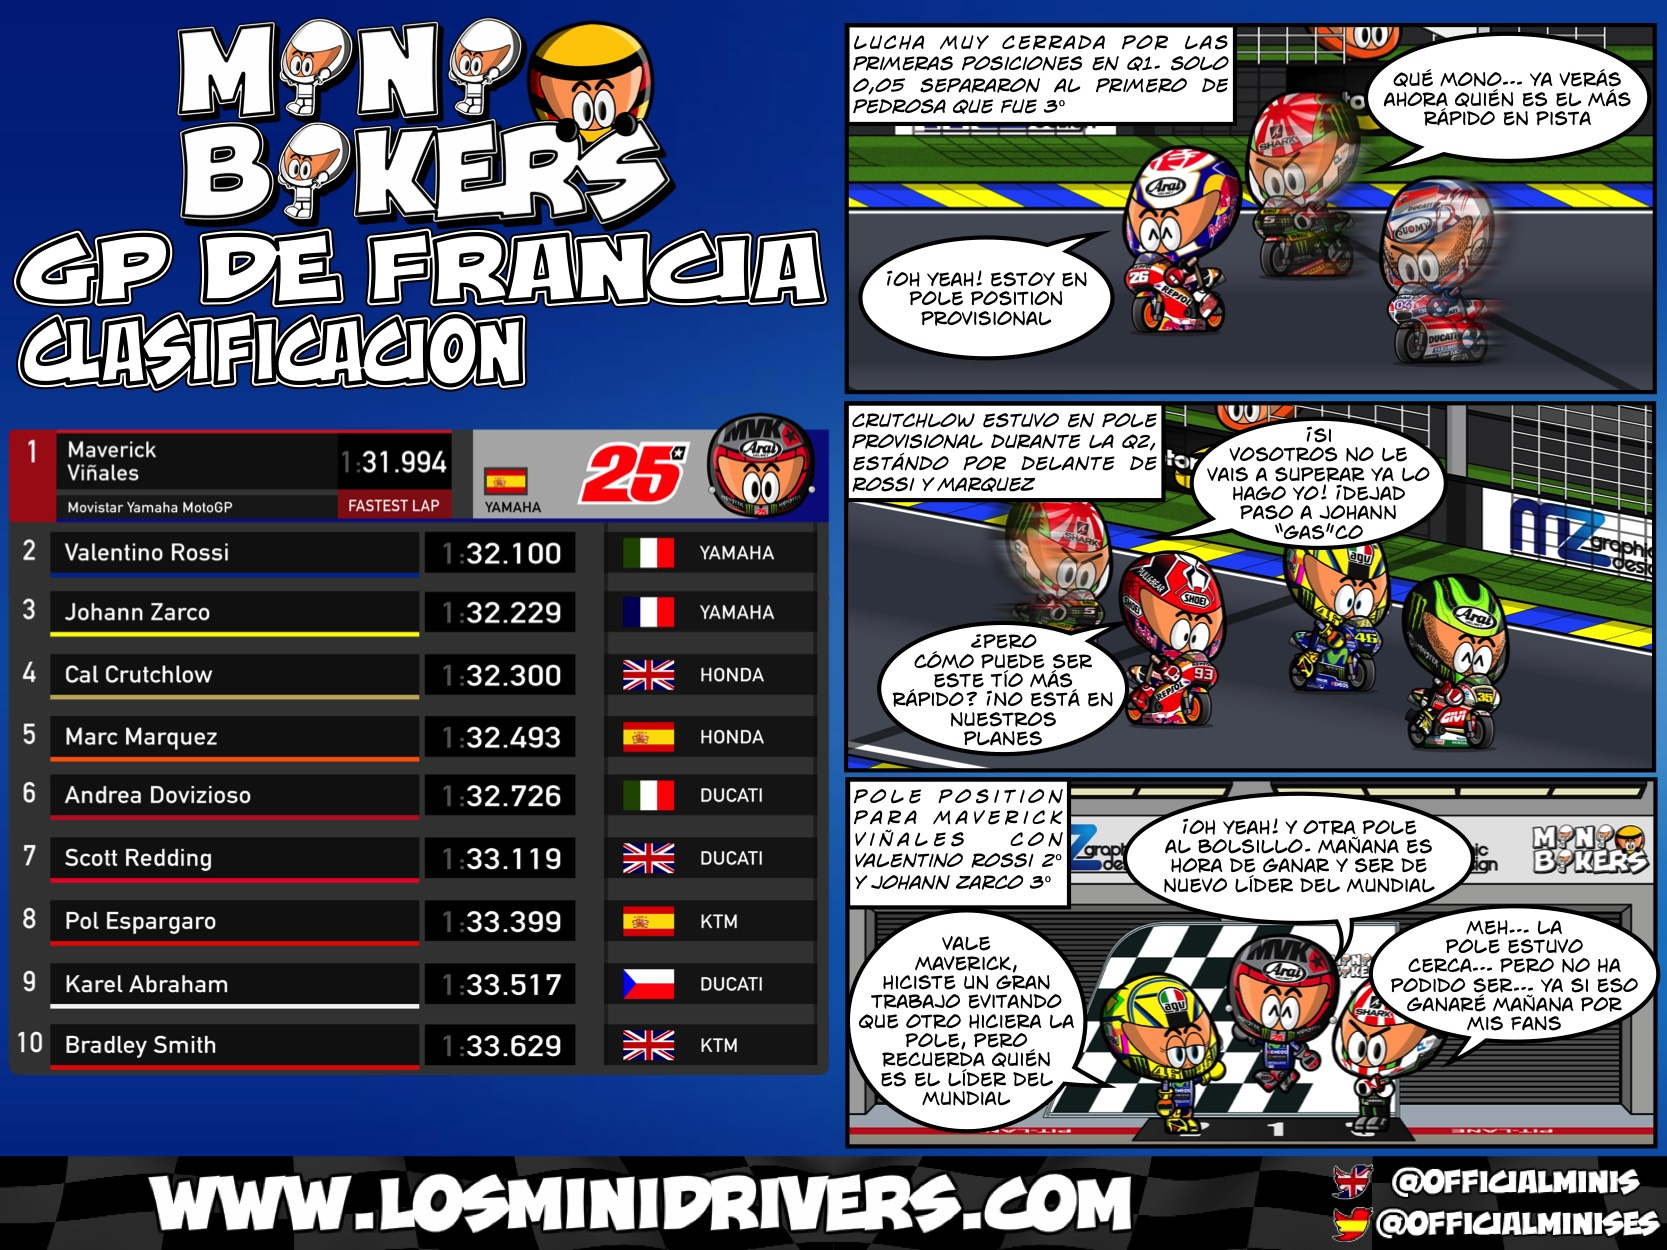 FrenchESP